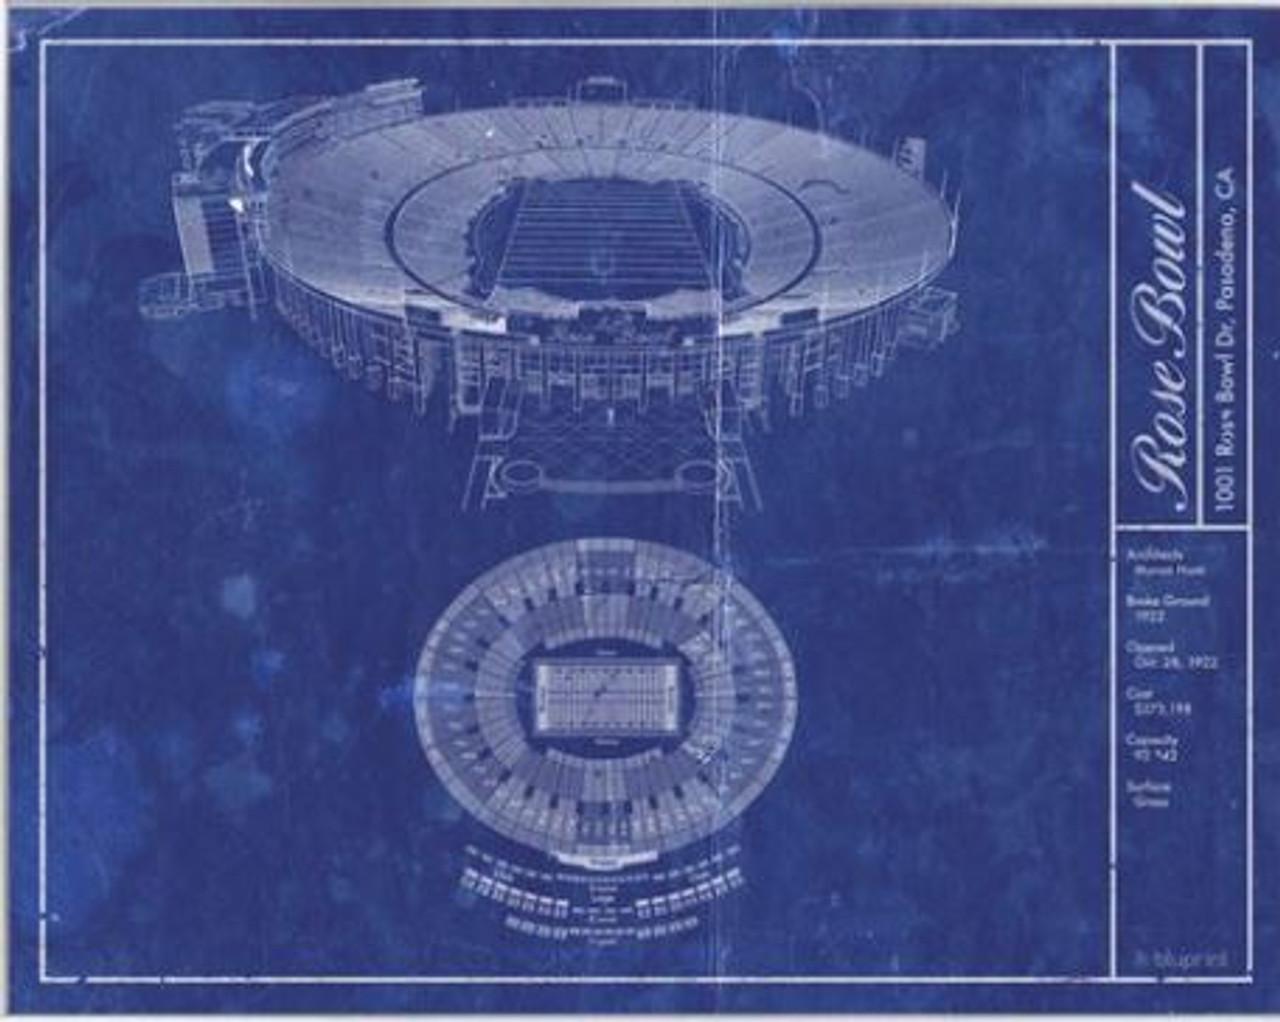 Rose Bowl Stadium Blueprint Poster